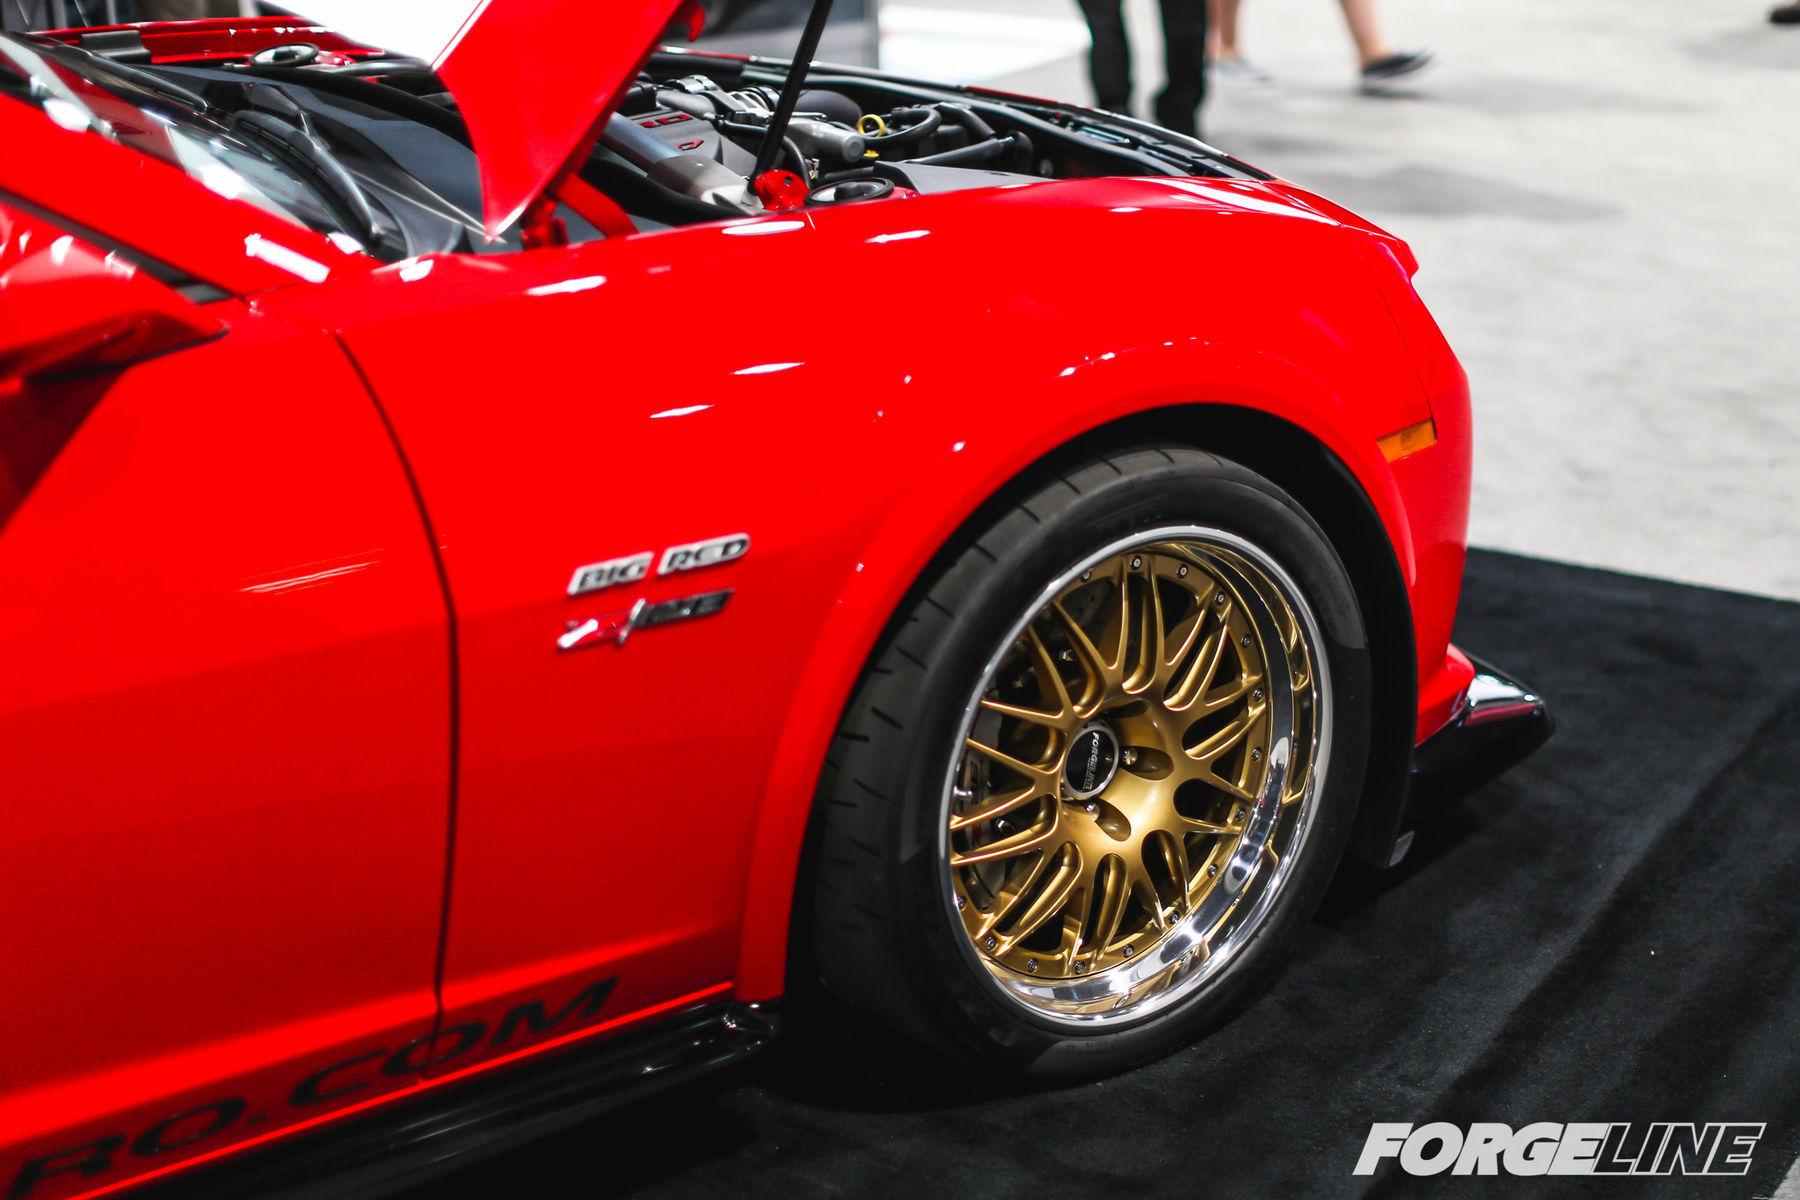 2015 Chevrolet Camaro | Big Red Edition Camaro on Forgeline GX3R Wheels